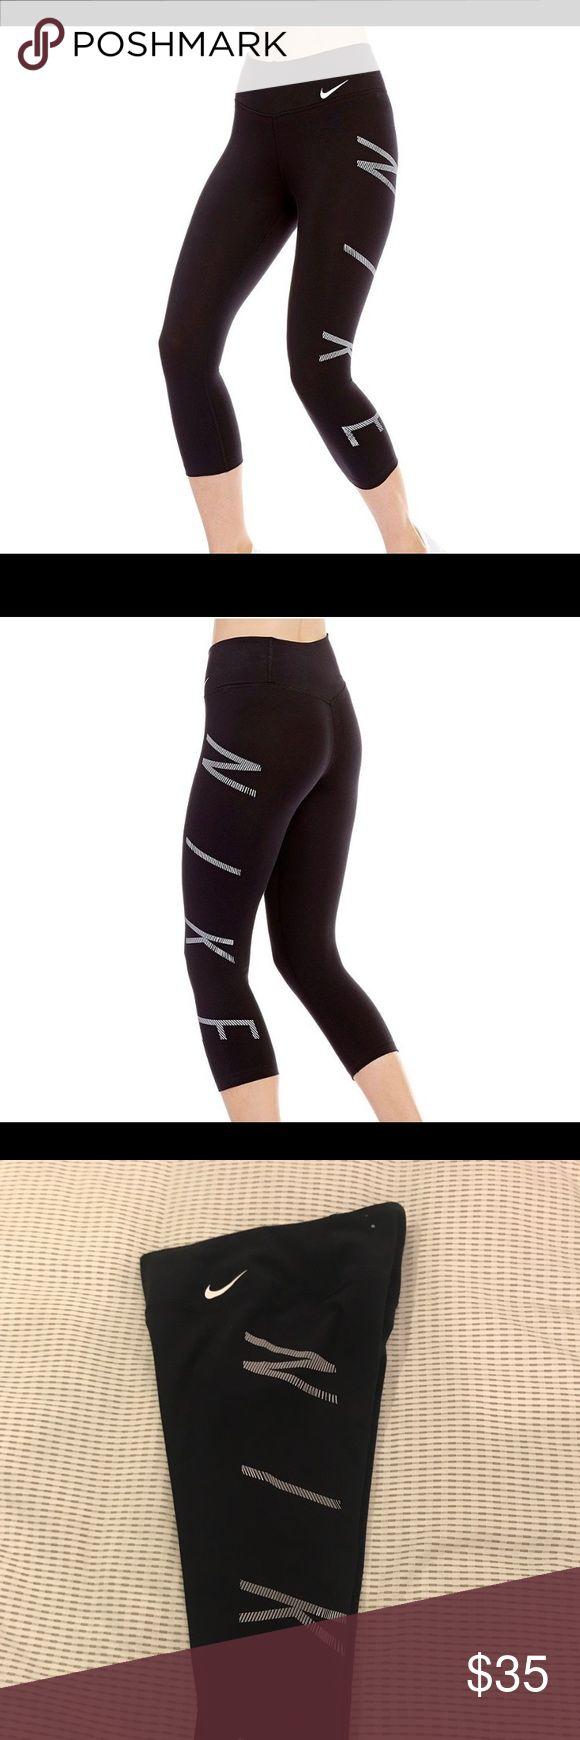 Nike Dry Training Capris Size Small NWT Nike Dry Training Capris Size Small NWT Nike Pants Capris